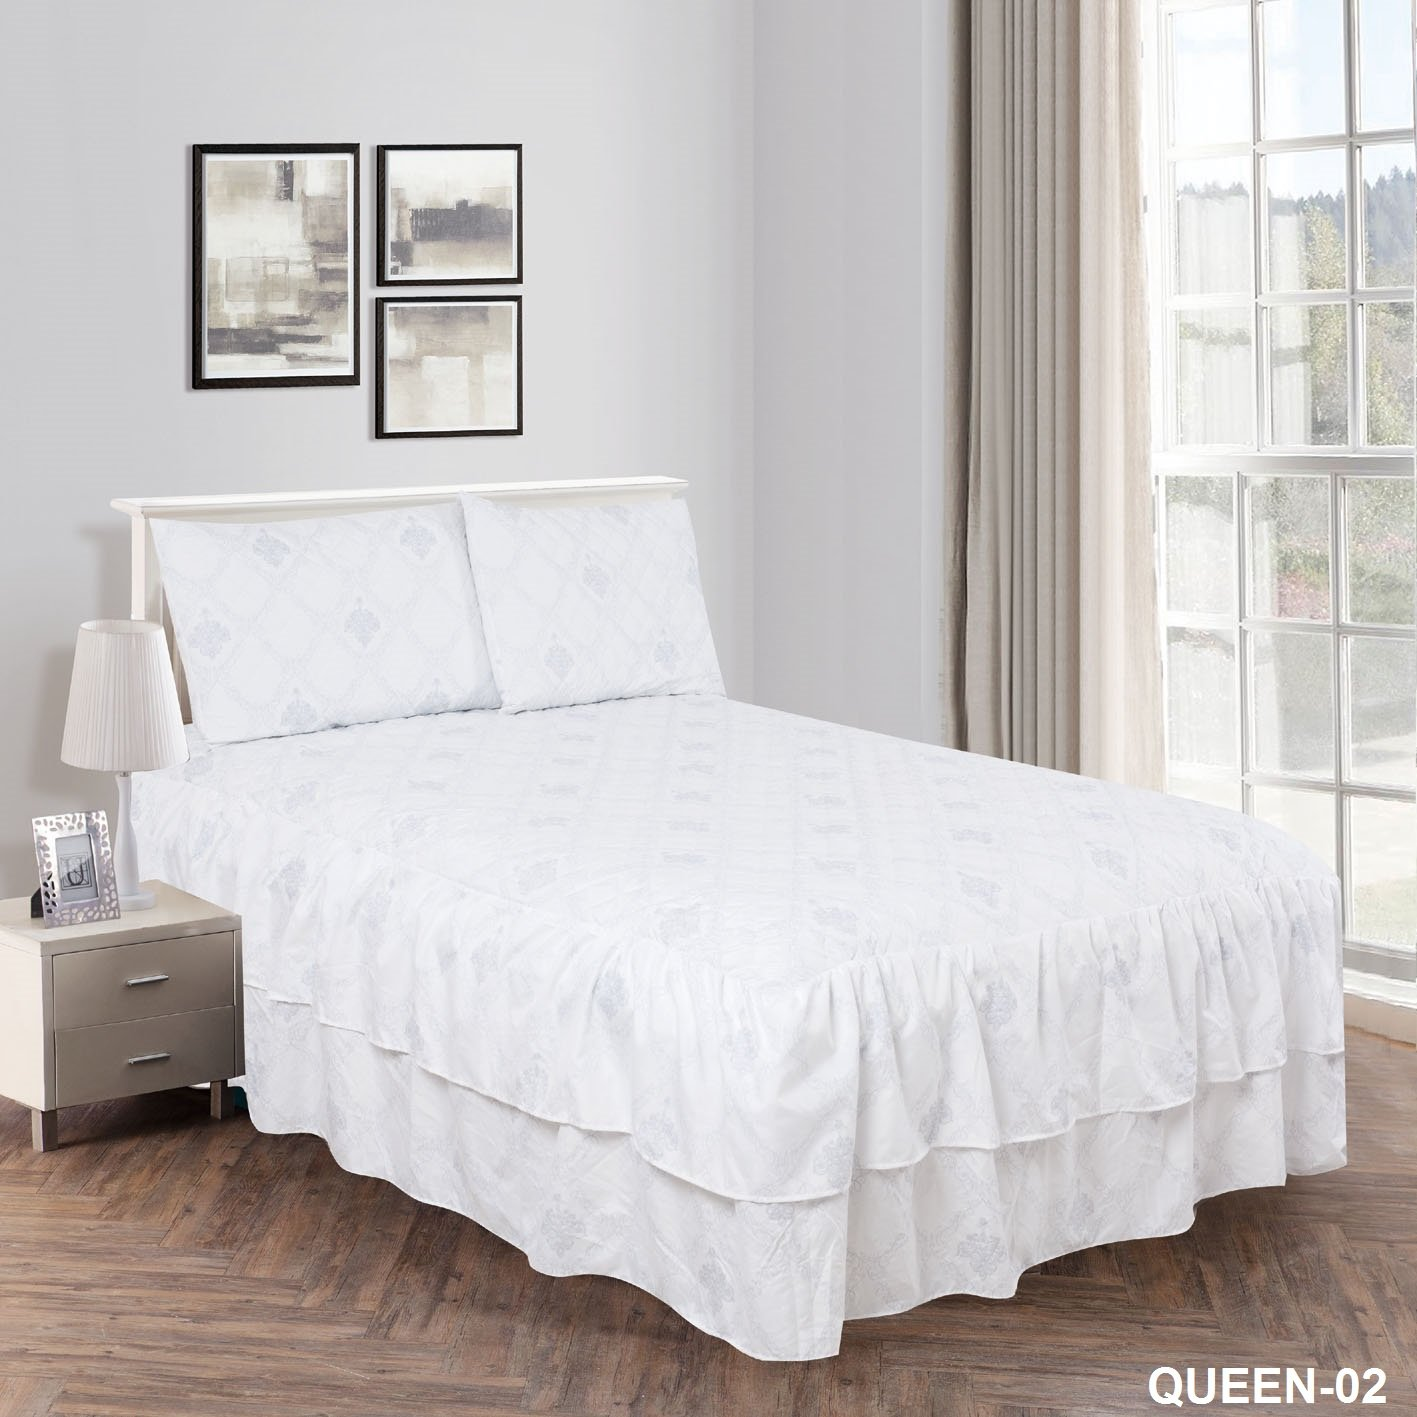 3 Piece Ultrasonic Printed Bed Spread with Double Ruffles Bedspread Set (Design-2, King) Jenin